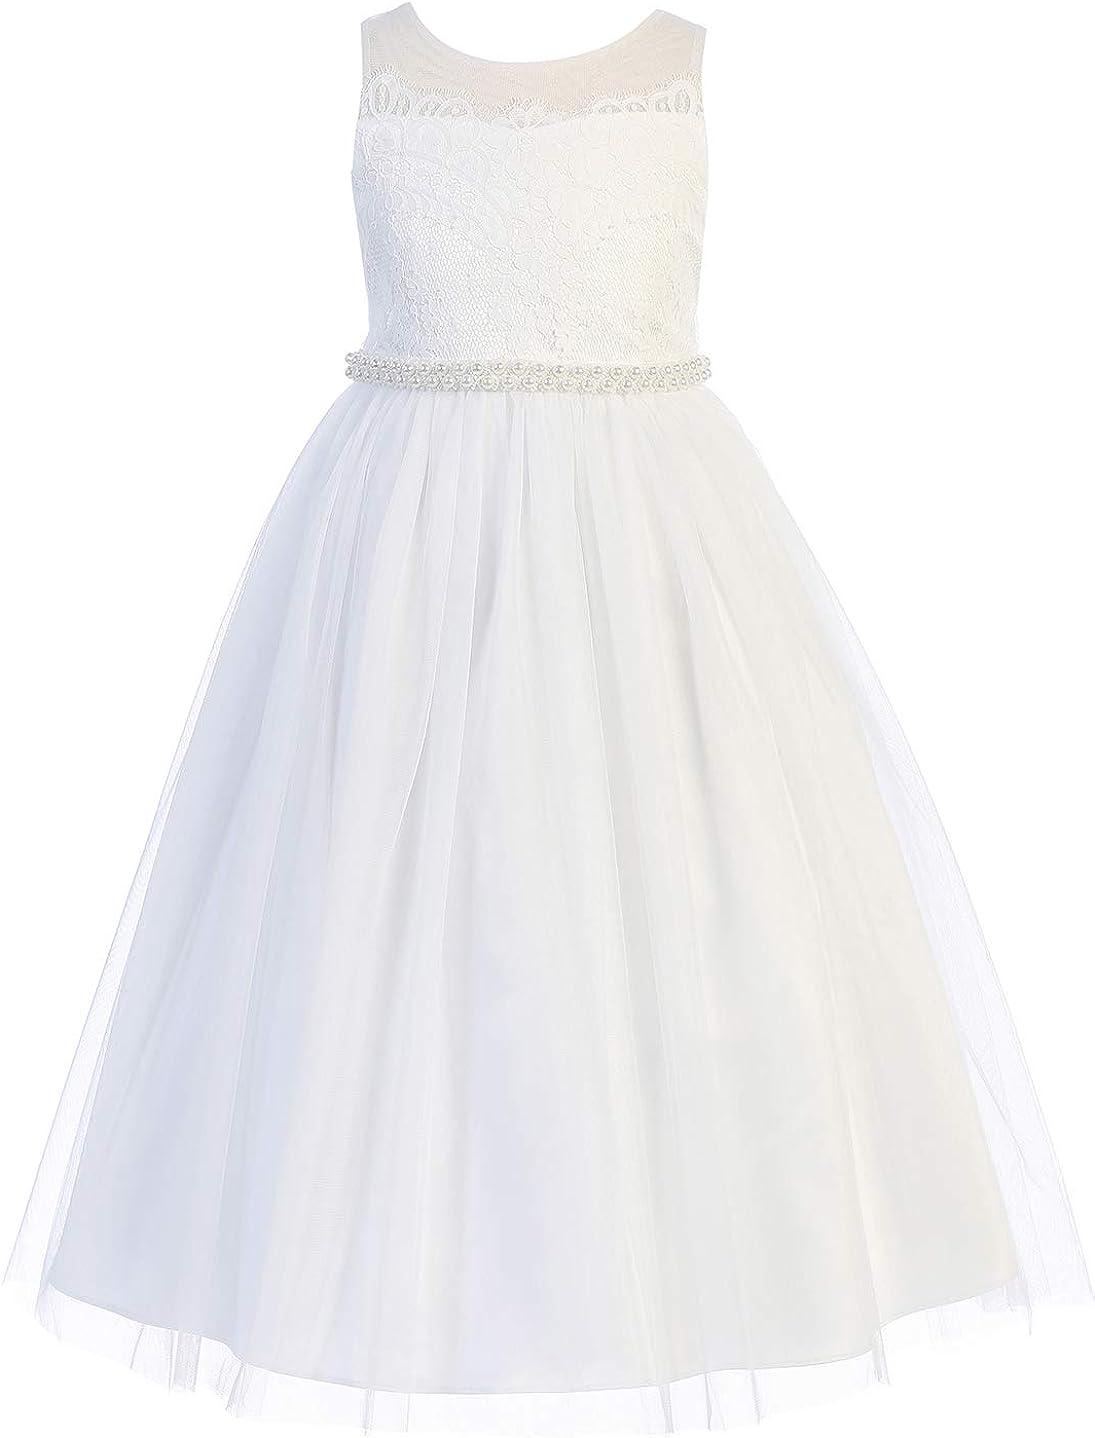 BluNight Flower Girl First Communion Pageant Wedding Birthday Party Girl Dress